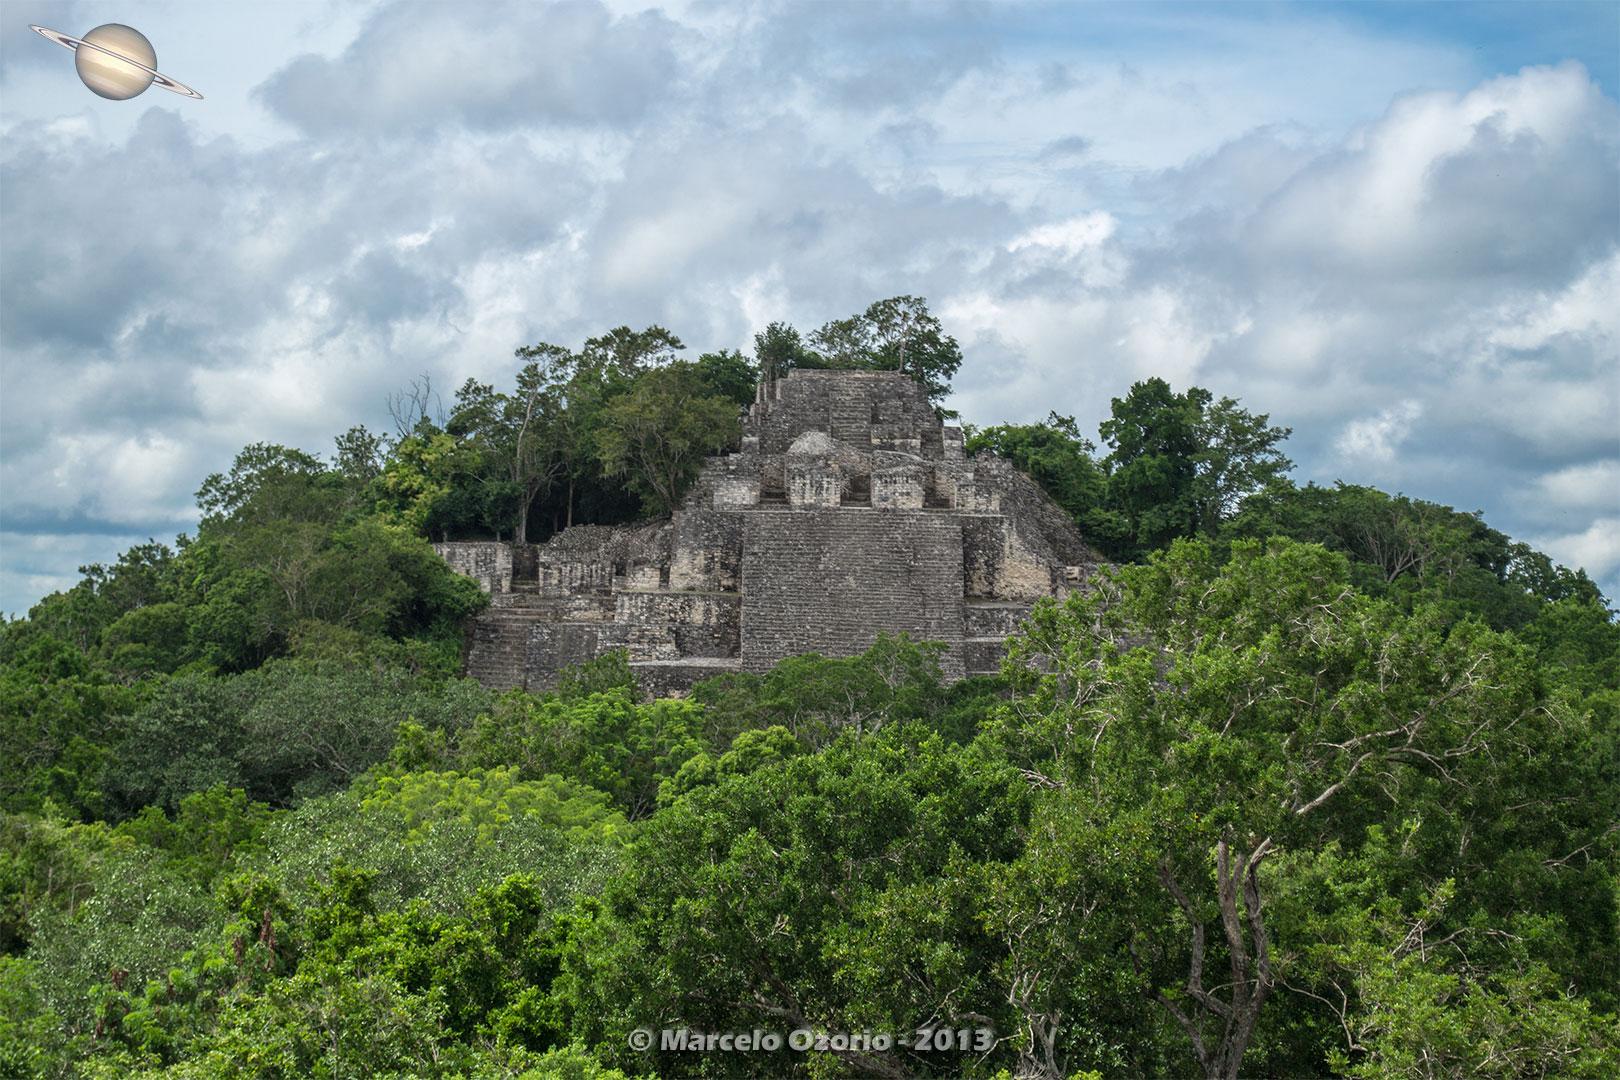 calakmul mayan civilization mexico 24 - Calakmul, City of the Two Adjacent Pyramids - Mexico